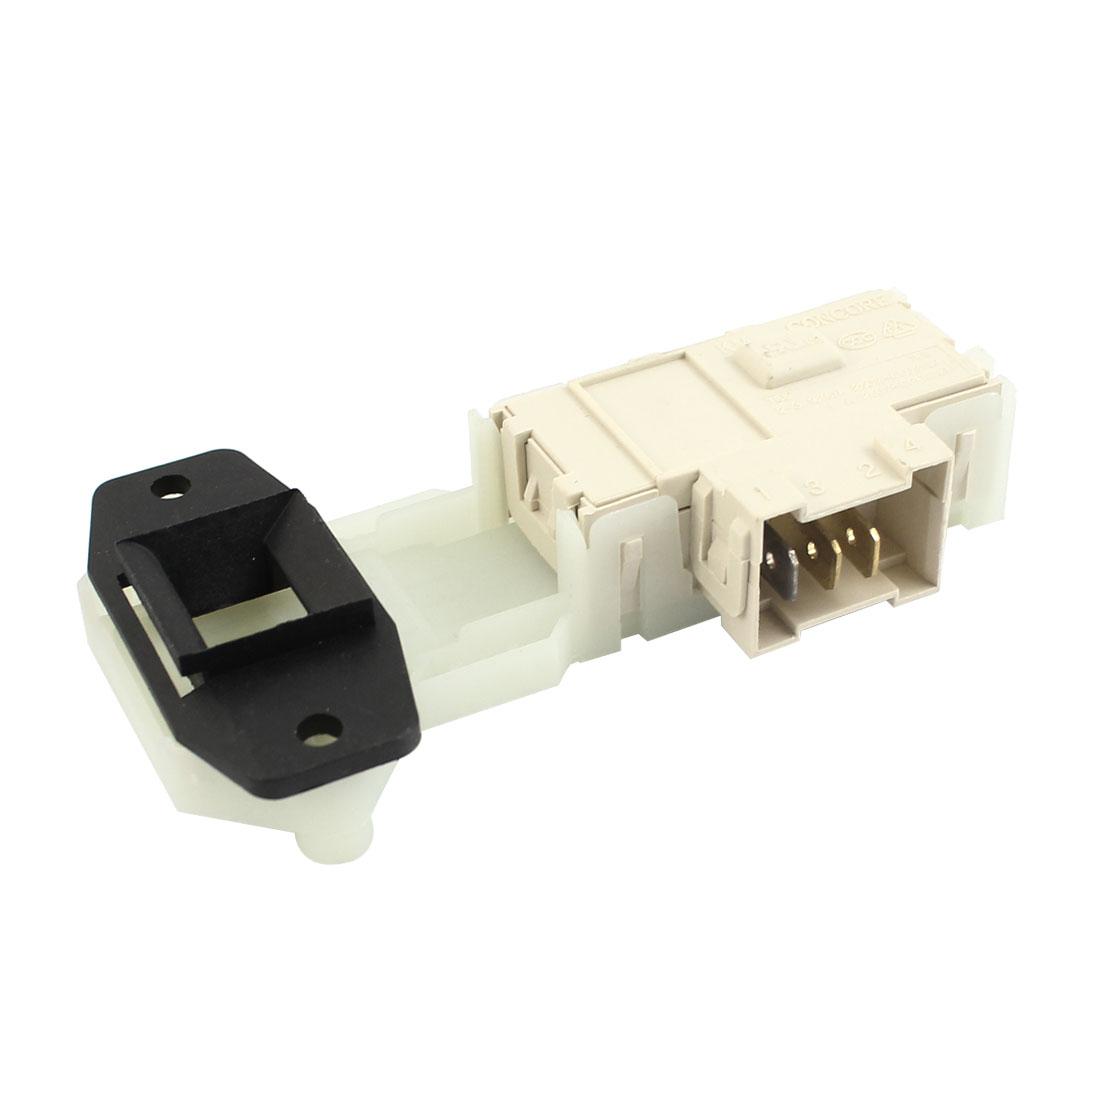 Washing Machine Washer Door Locking Lock Interlock Black for LG Little Swan